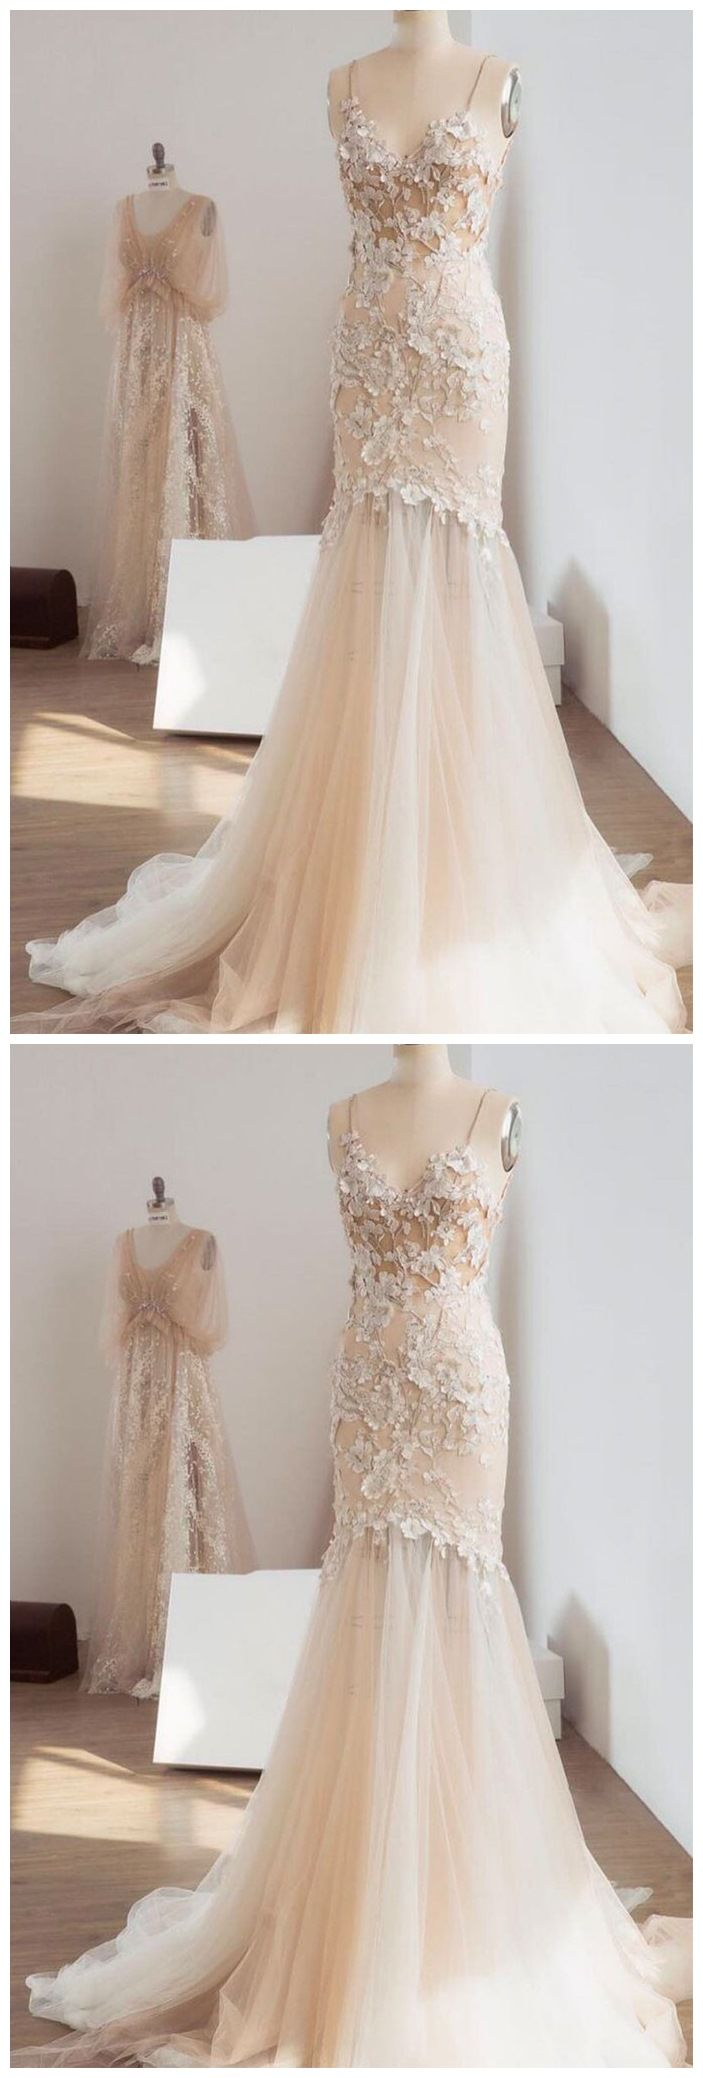 Champagne mermaid wedding dresses spaghetti strap lace appliqued